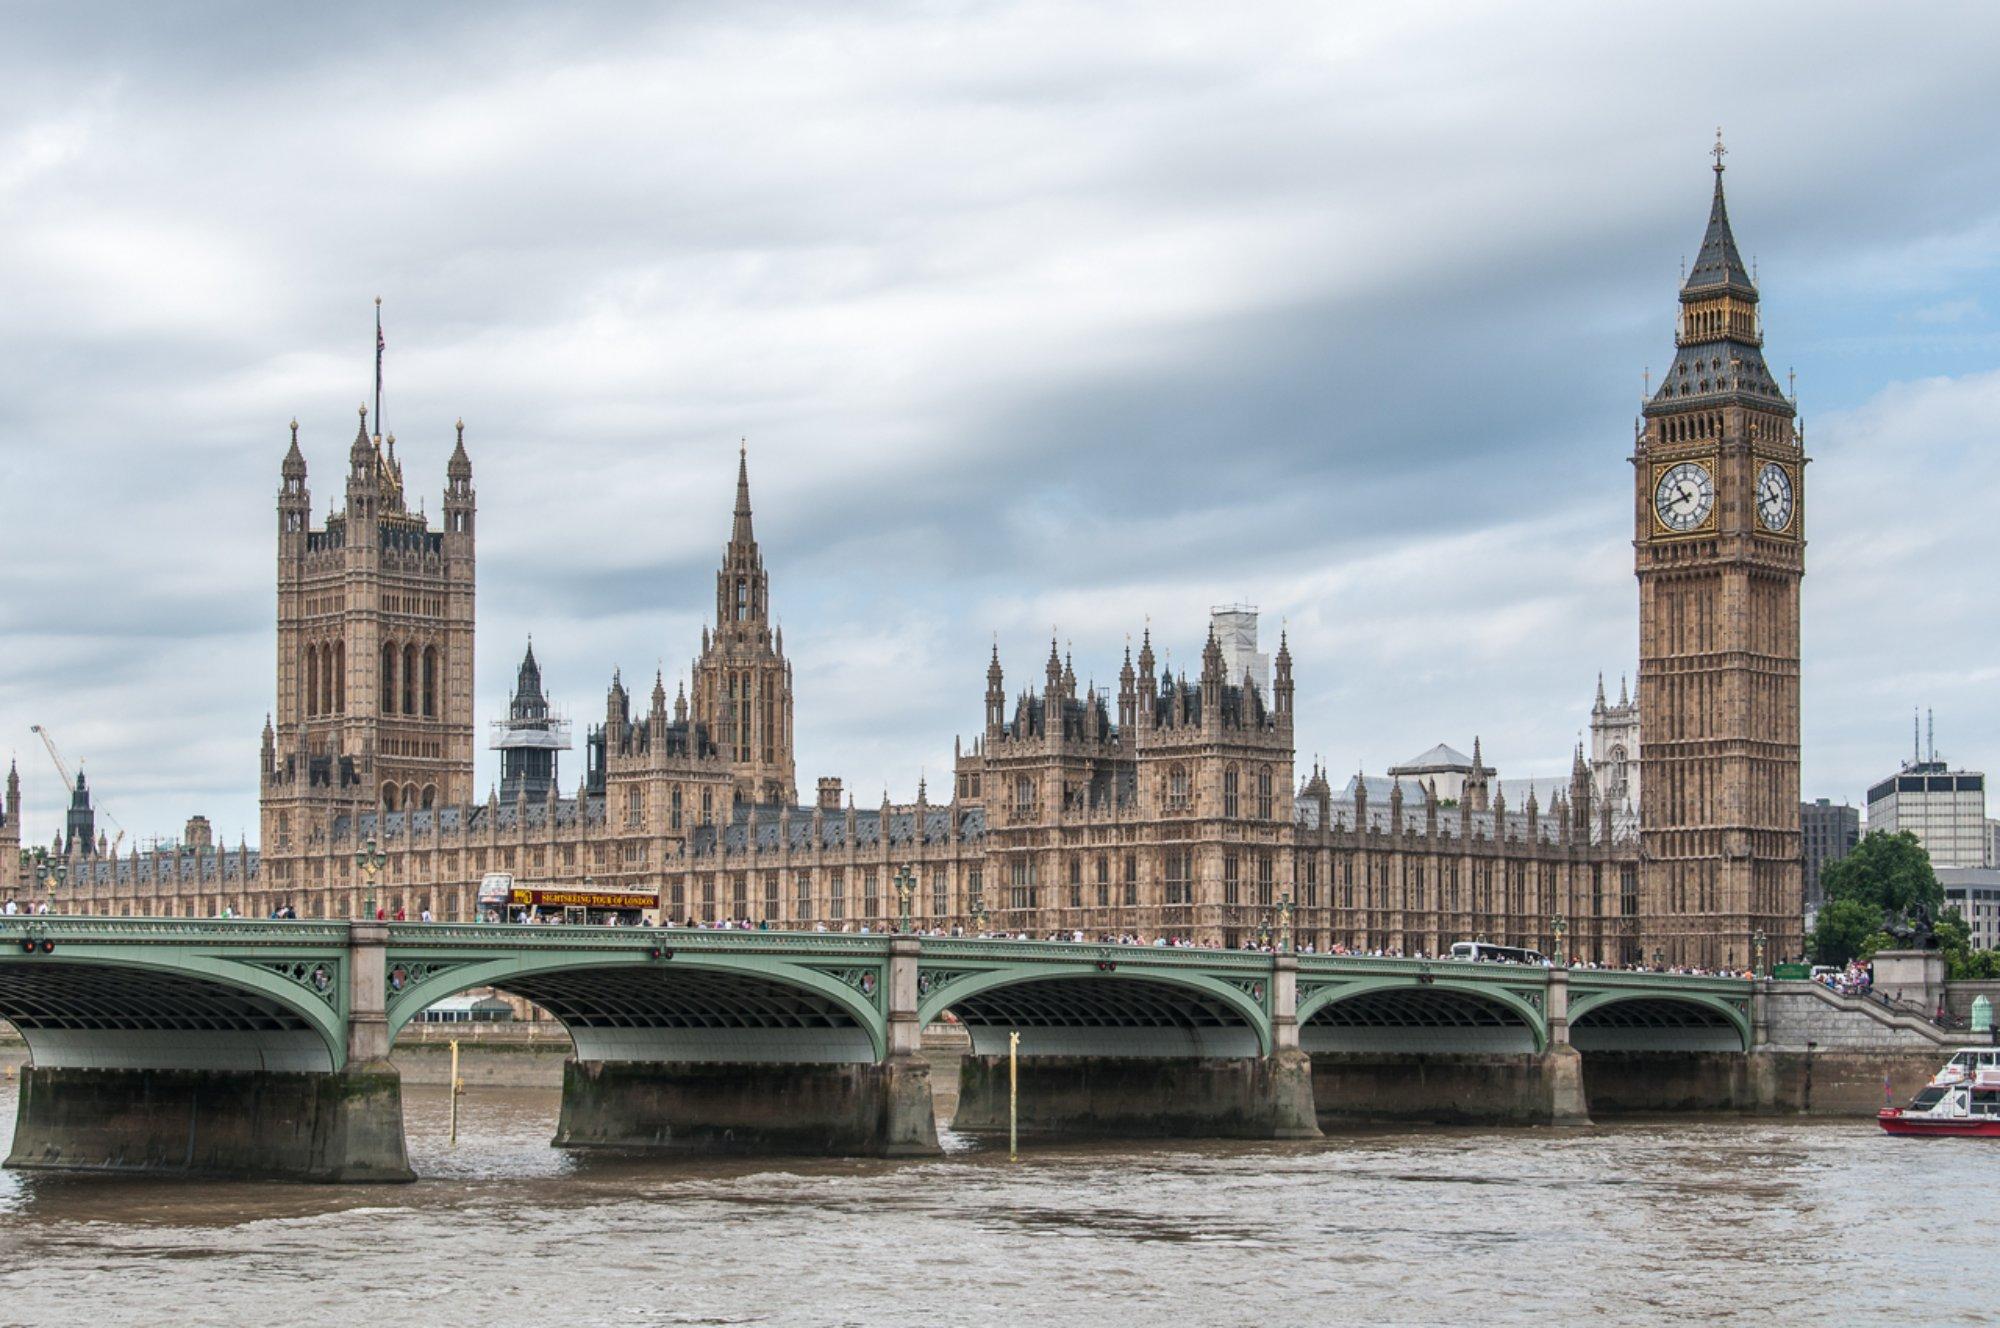 #LondonIsOpen – Brilliantly Designed Campaign